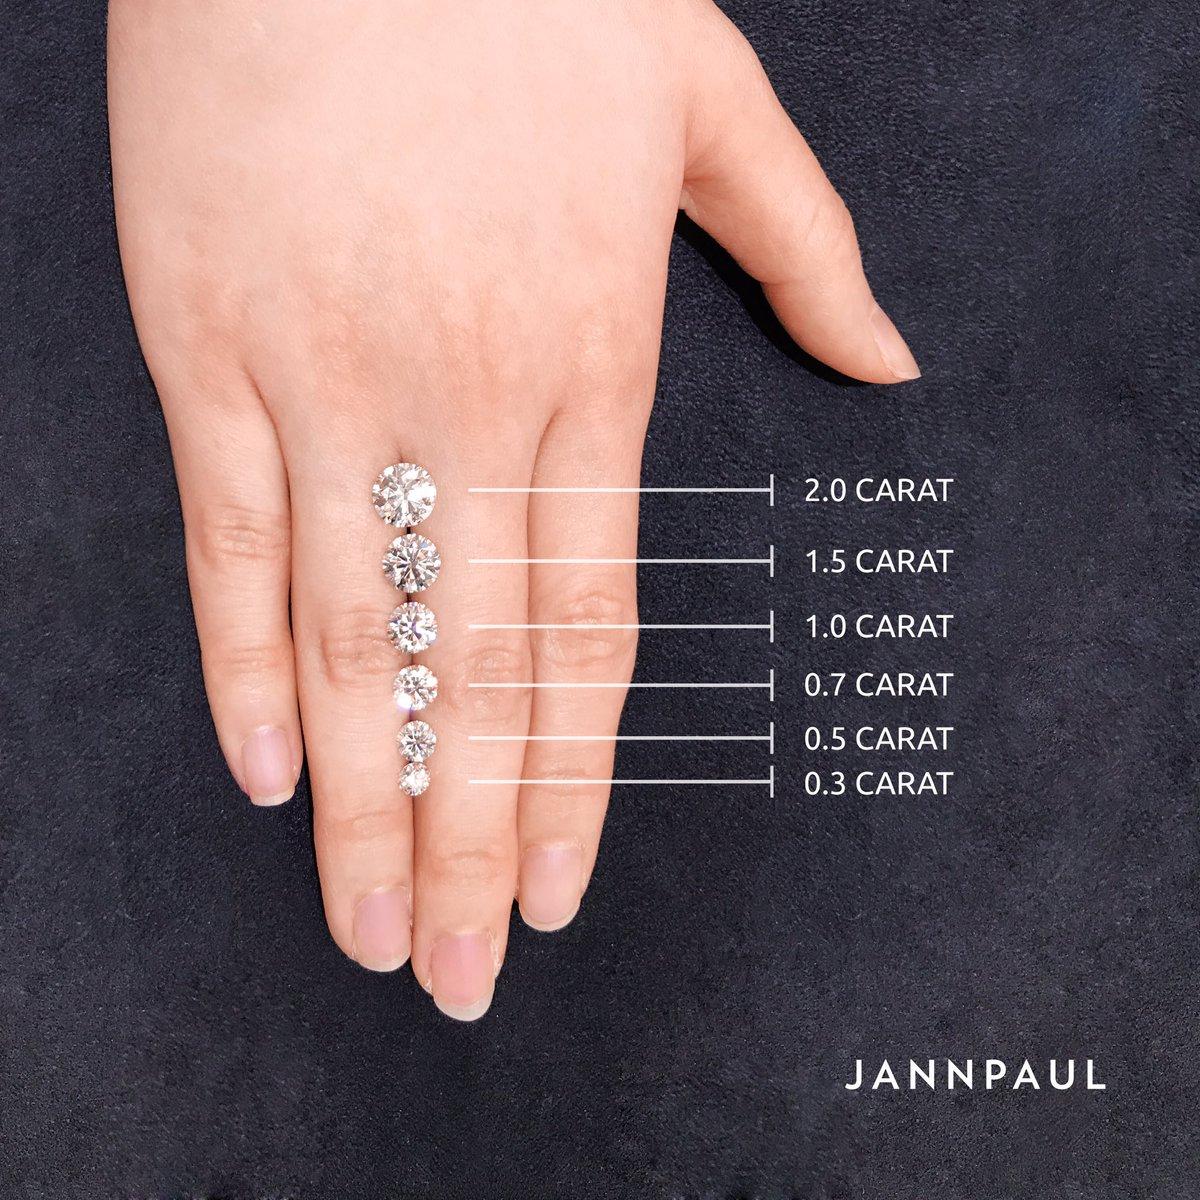 Jannpaul twitter search 0 replies 0 retweets 0 likes nvjuhfo Choice Image